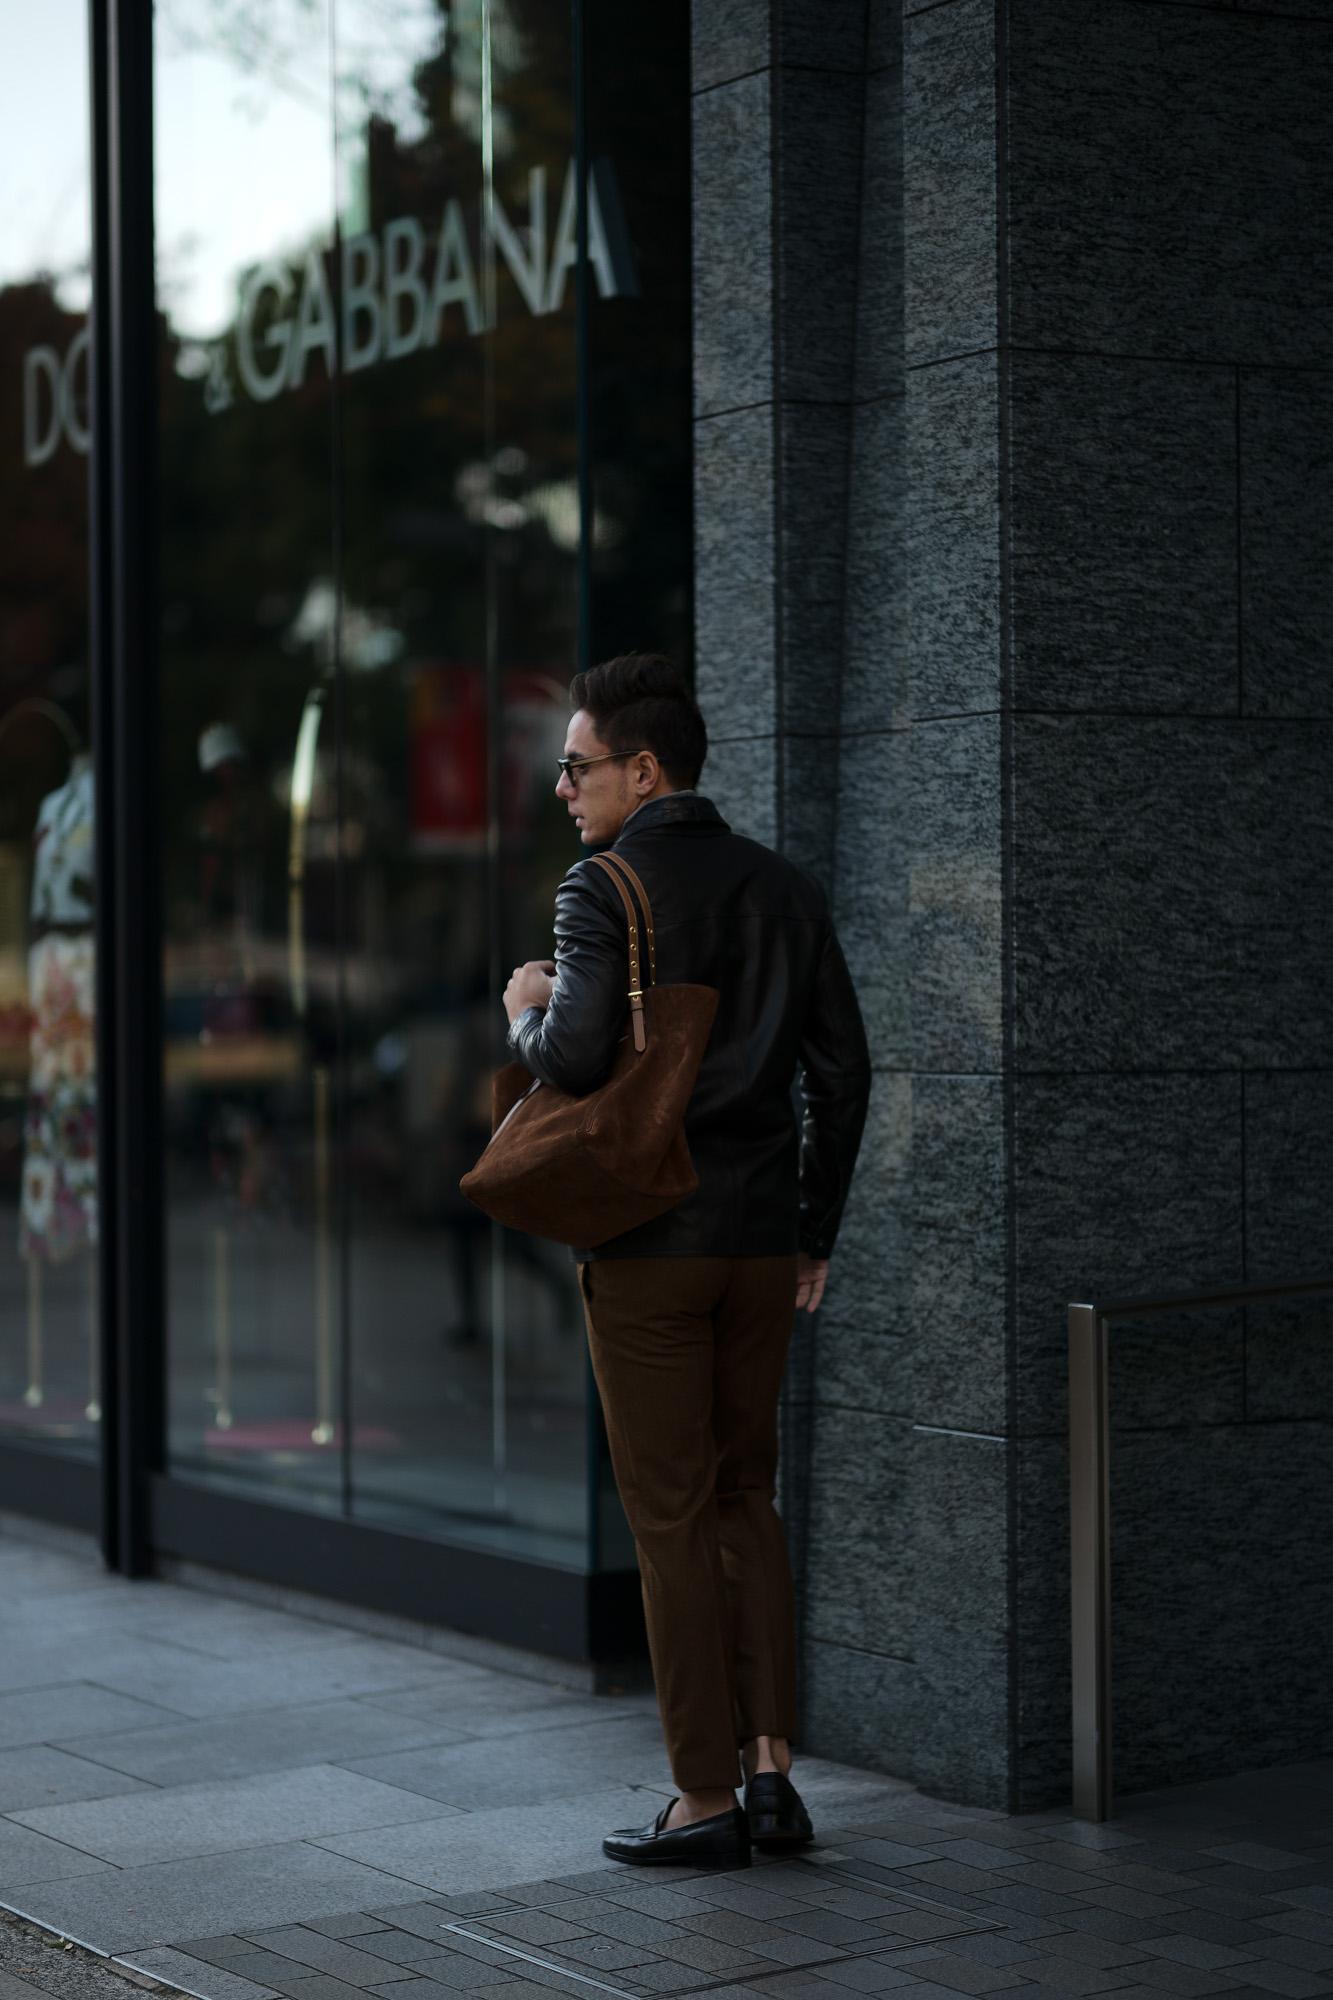 J&M DAVIDSON (ジェイアンドエムデヴィッドソン) RITA L (リタ L) SUEDE LEATHER (スウェードレザー) トートバッグ BROWN (ブラウン・652) Made in spain (スペイン製) 2018 秋冬新作 jandmdavidson jmdavidson 愛知 名古屋 alto e diritto アルトエデリット LOUIS VUITTON LOUISVUITTON ルイ・ヴィトン ルイヴィトン クラッチバック